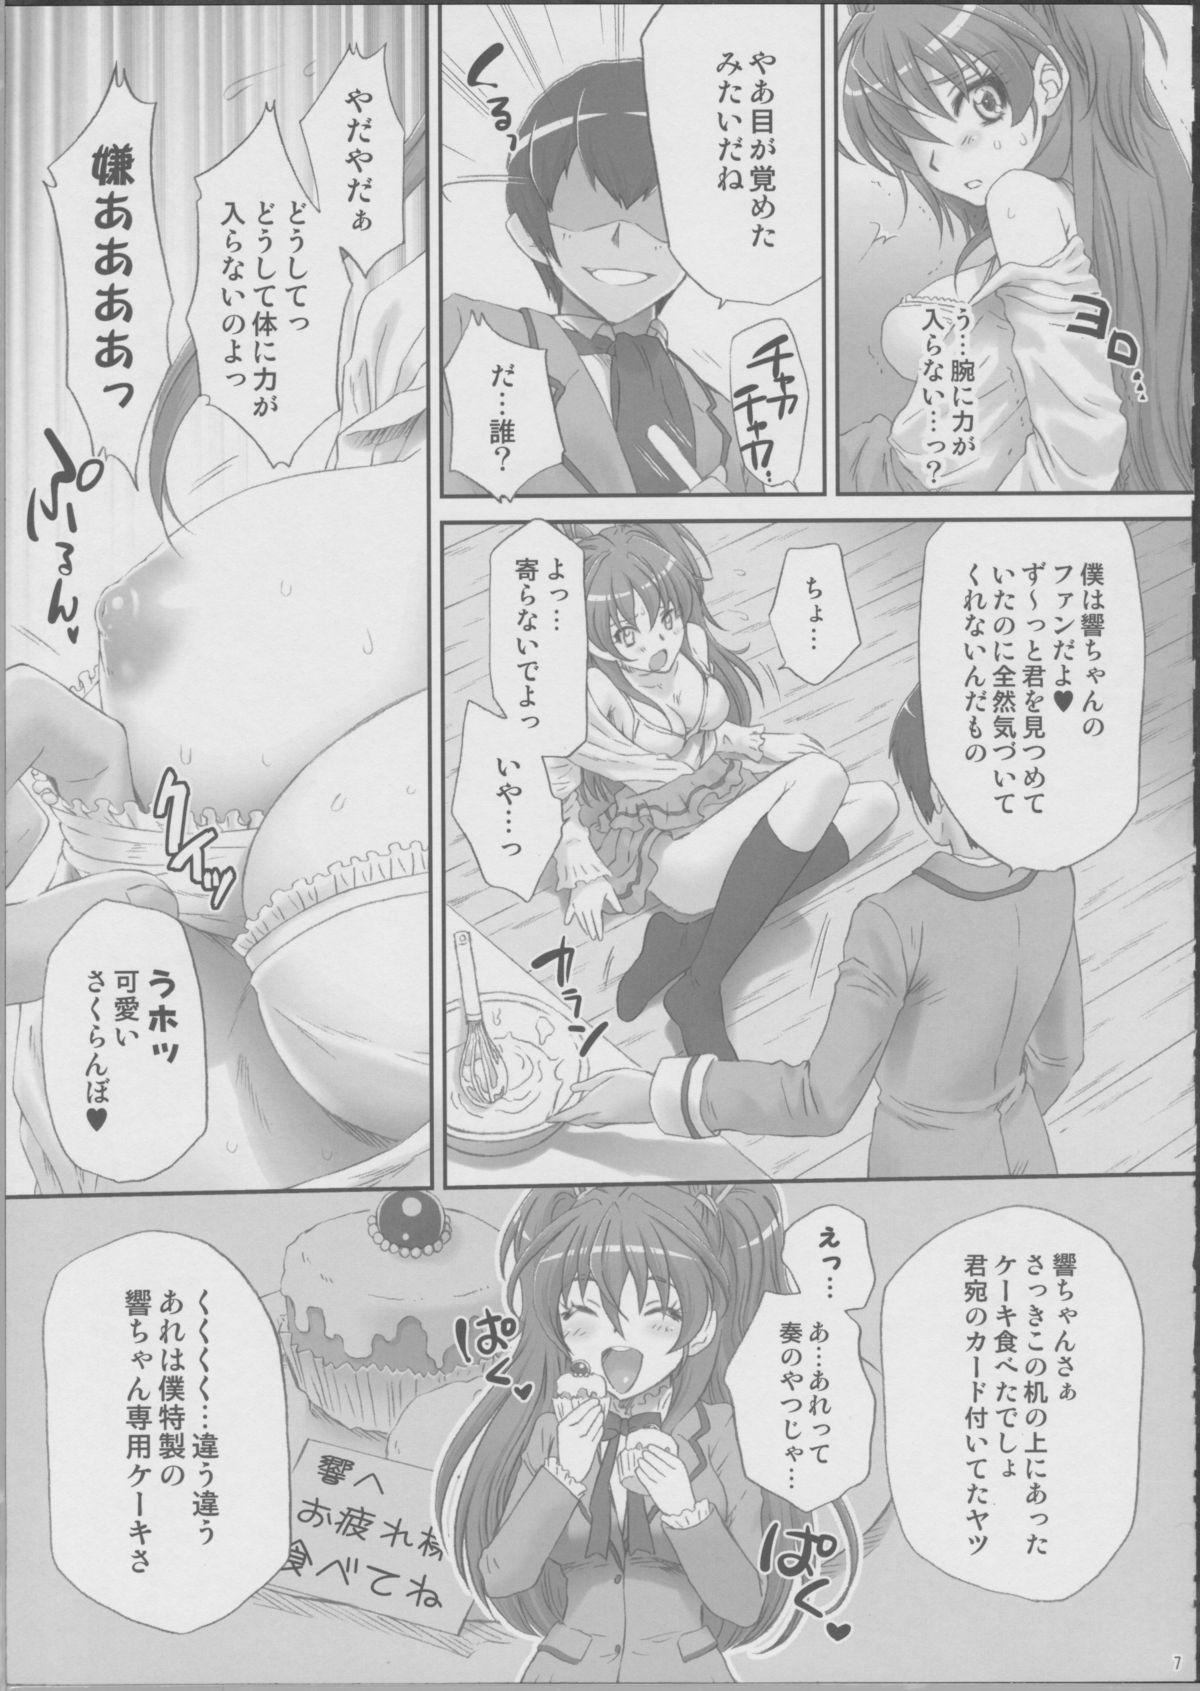 Hibiki de asobou ♪ 5